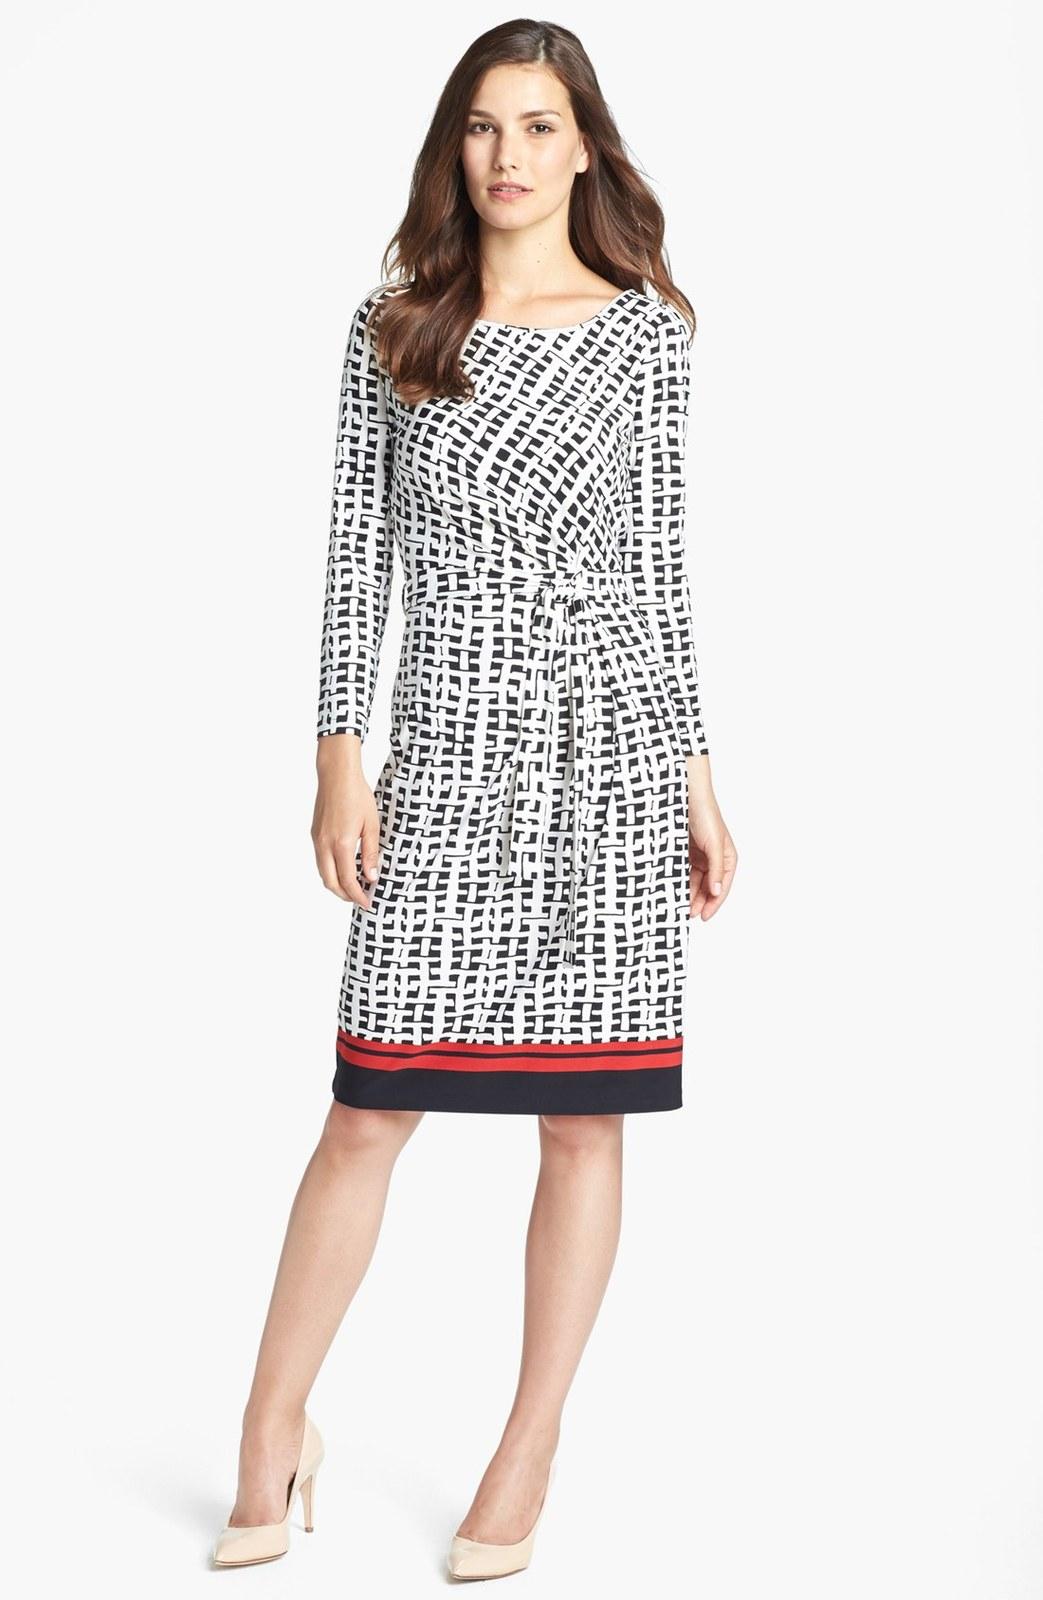 Anne klein black camellia multi tie front wicker print dress product 1 14480220 585165964